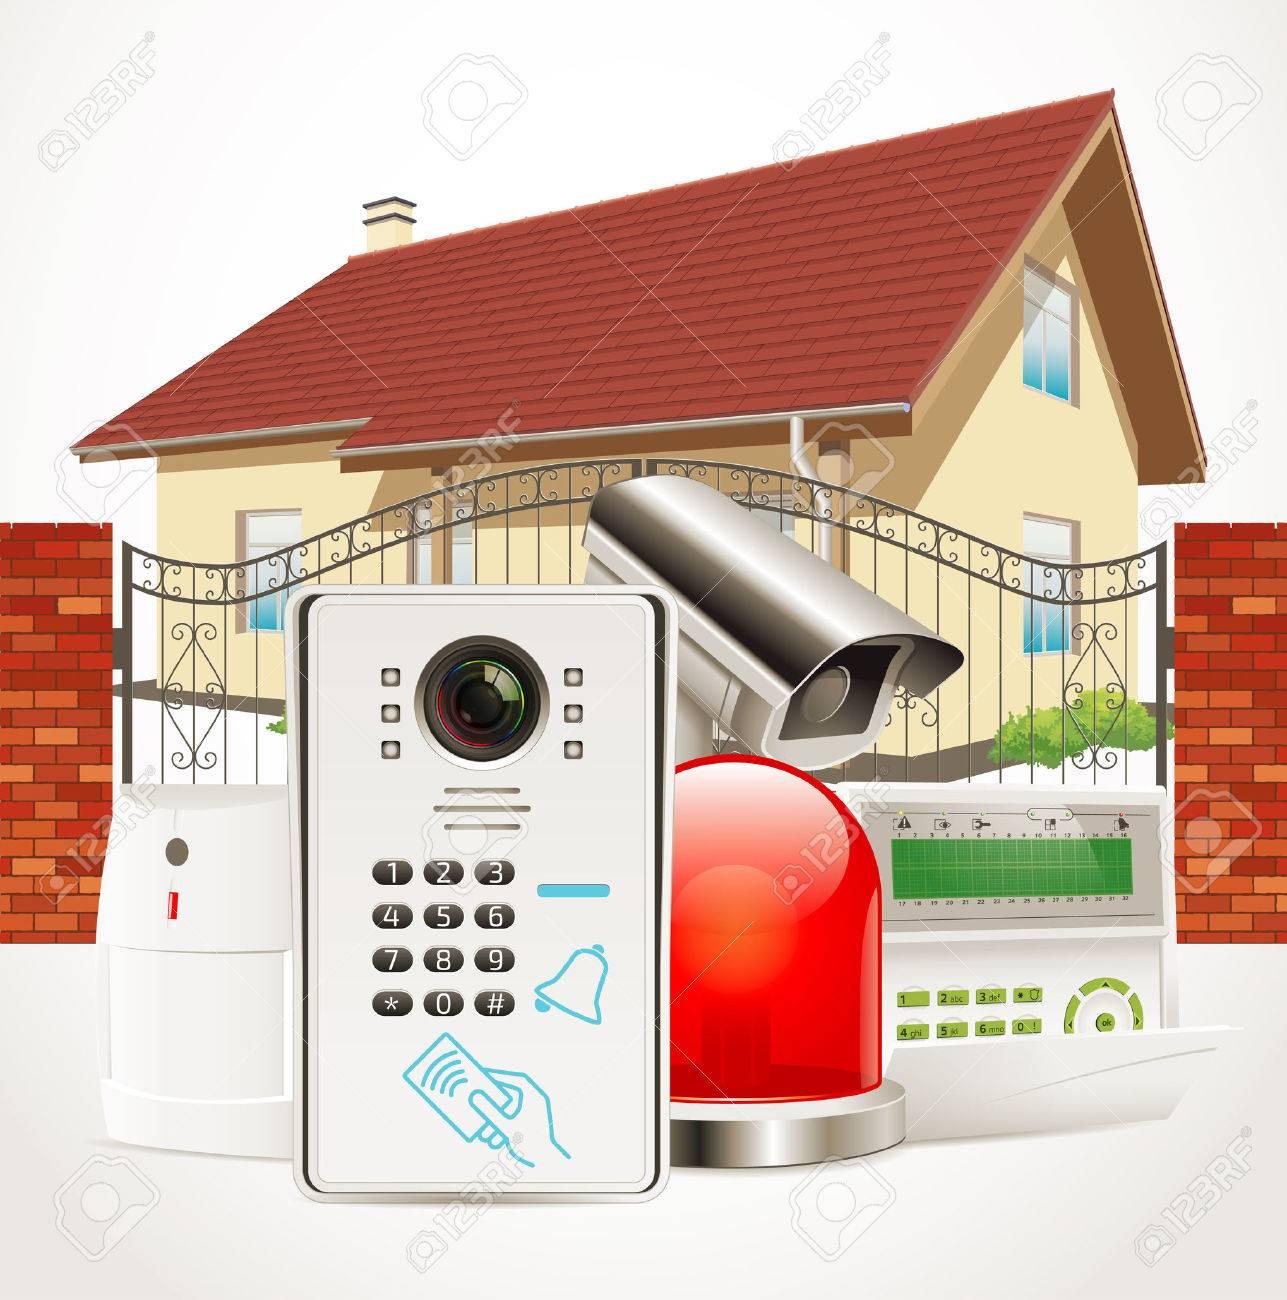 Home Access Control System Video Door Phone Alarm House Security Motion Sensor Cctv